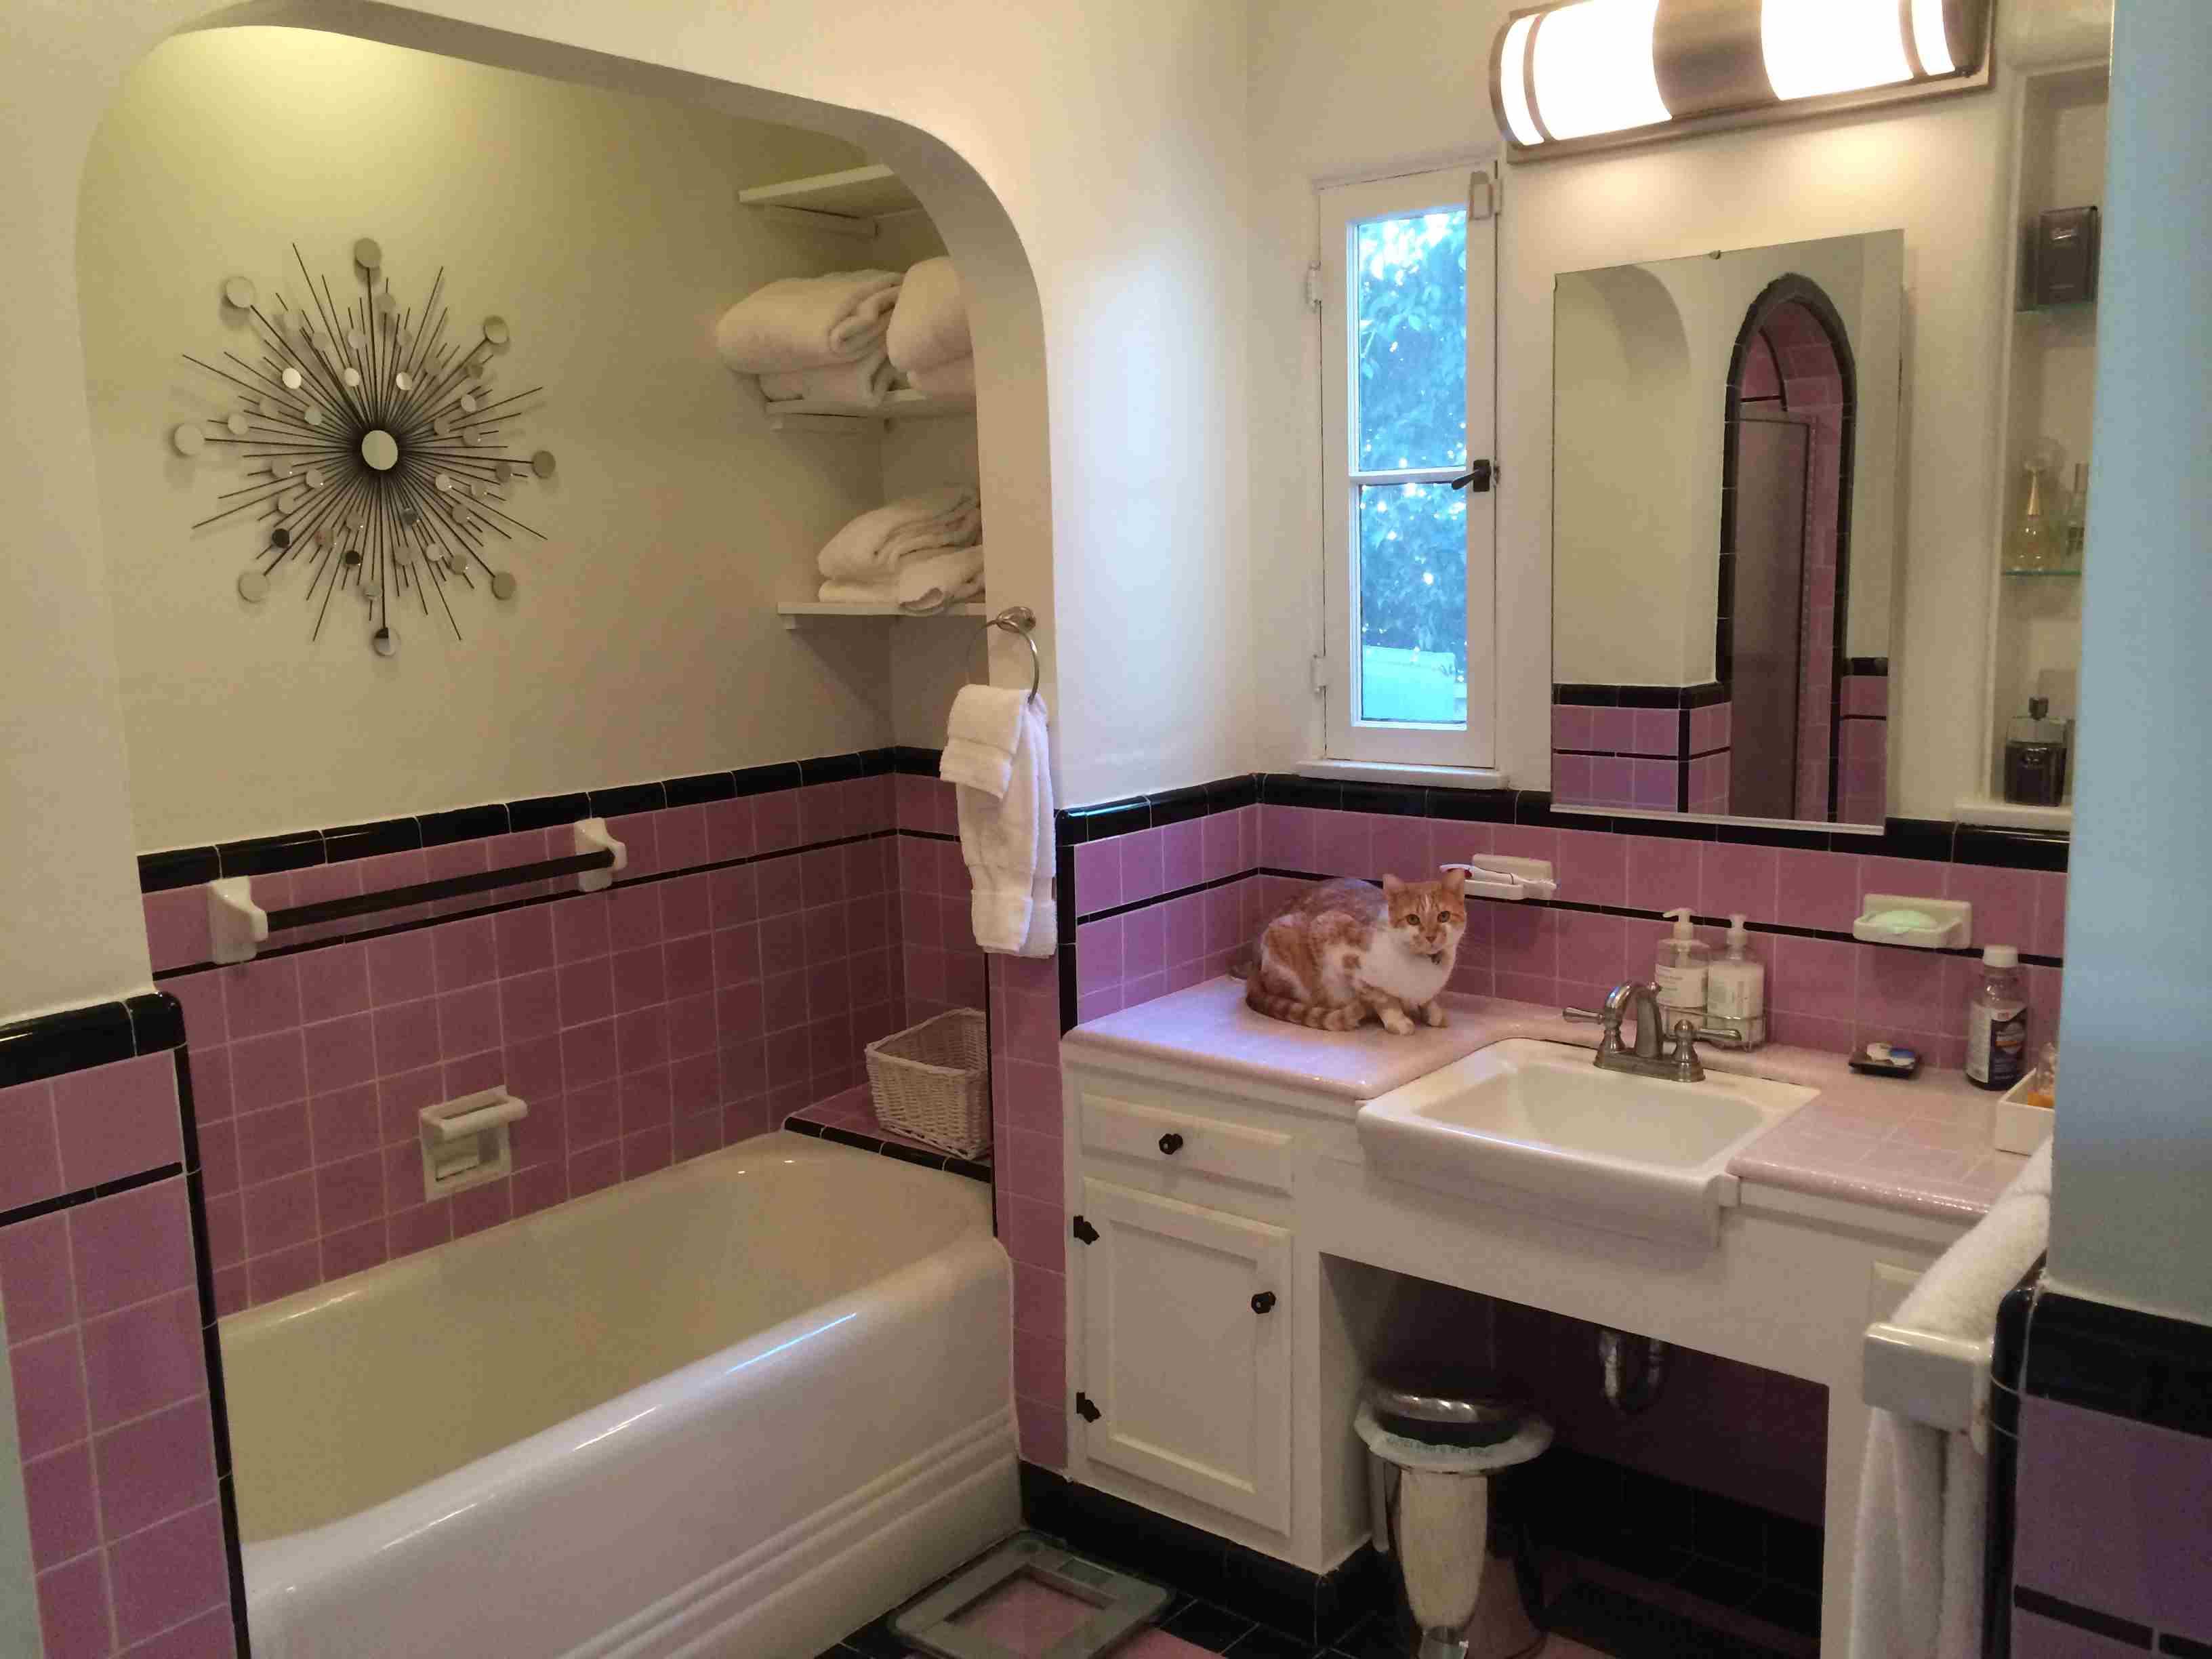 Deco Bathroom Makeover Before